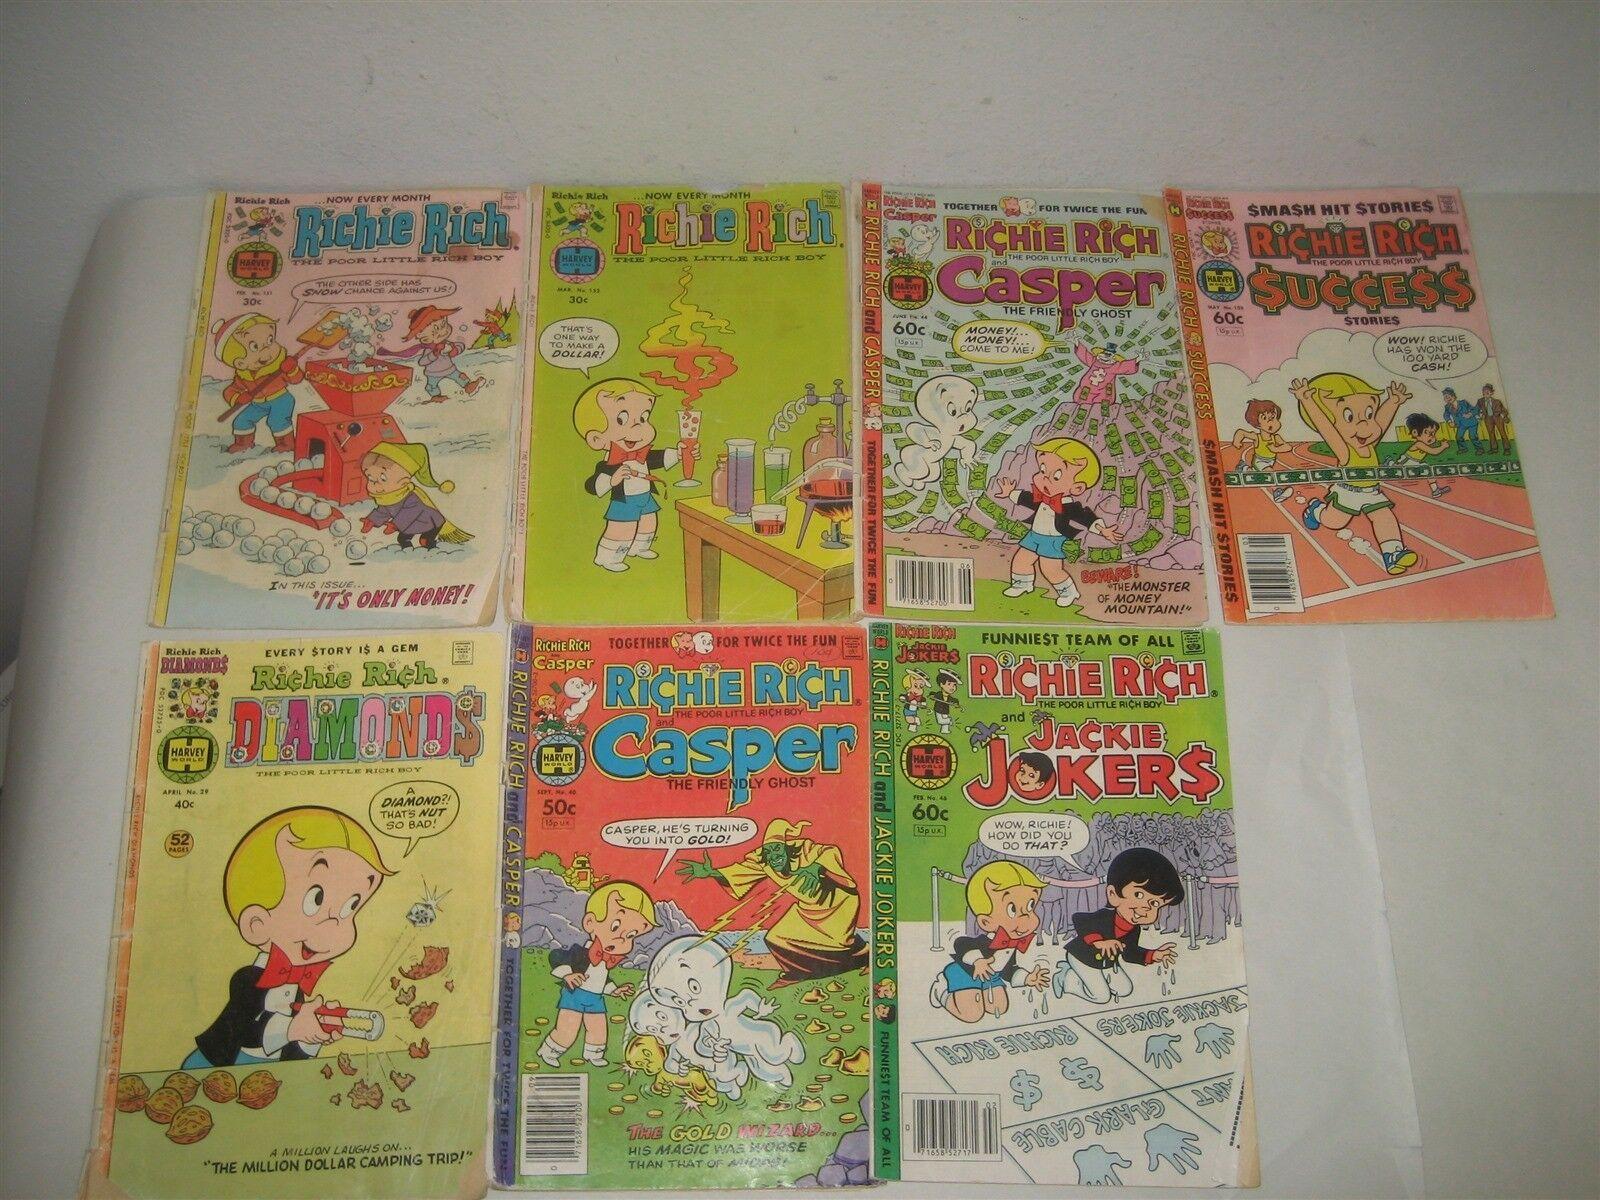 Lot of Seven (7) Richie Rich Comic Books Paperbacks Casper Success Jackie Jokers